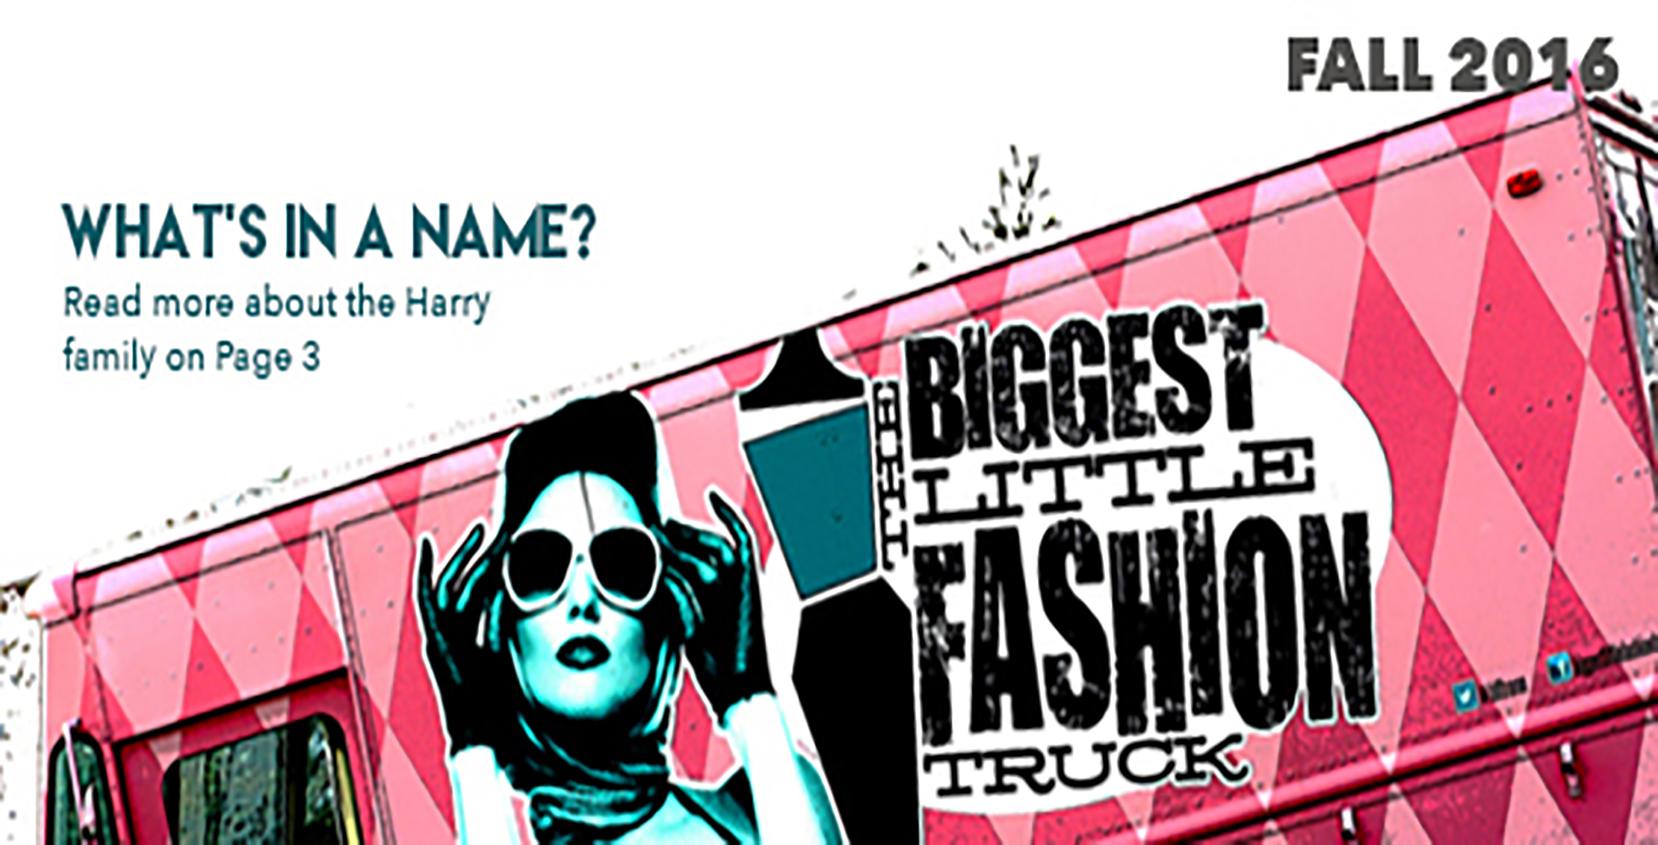 Fashion truck mock up, Fall 2016